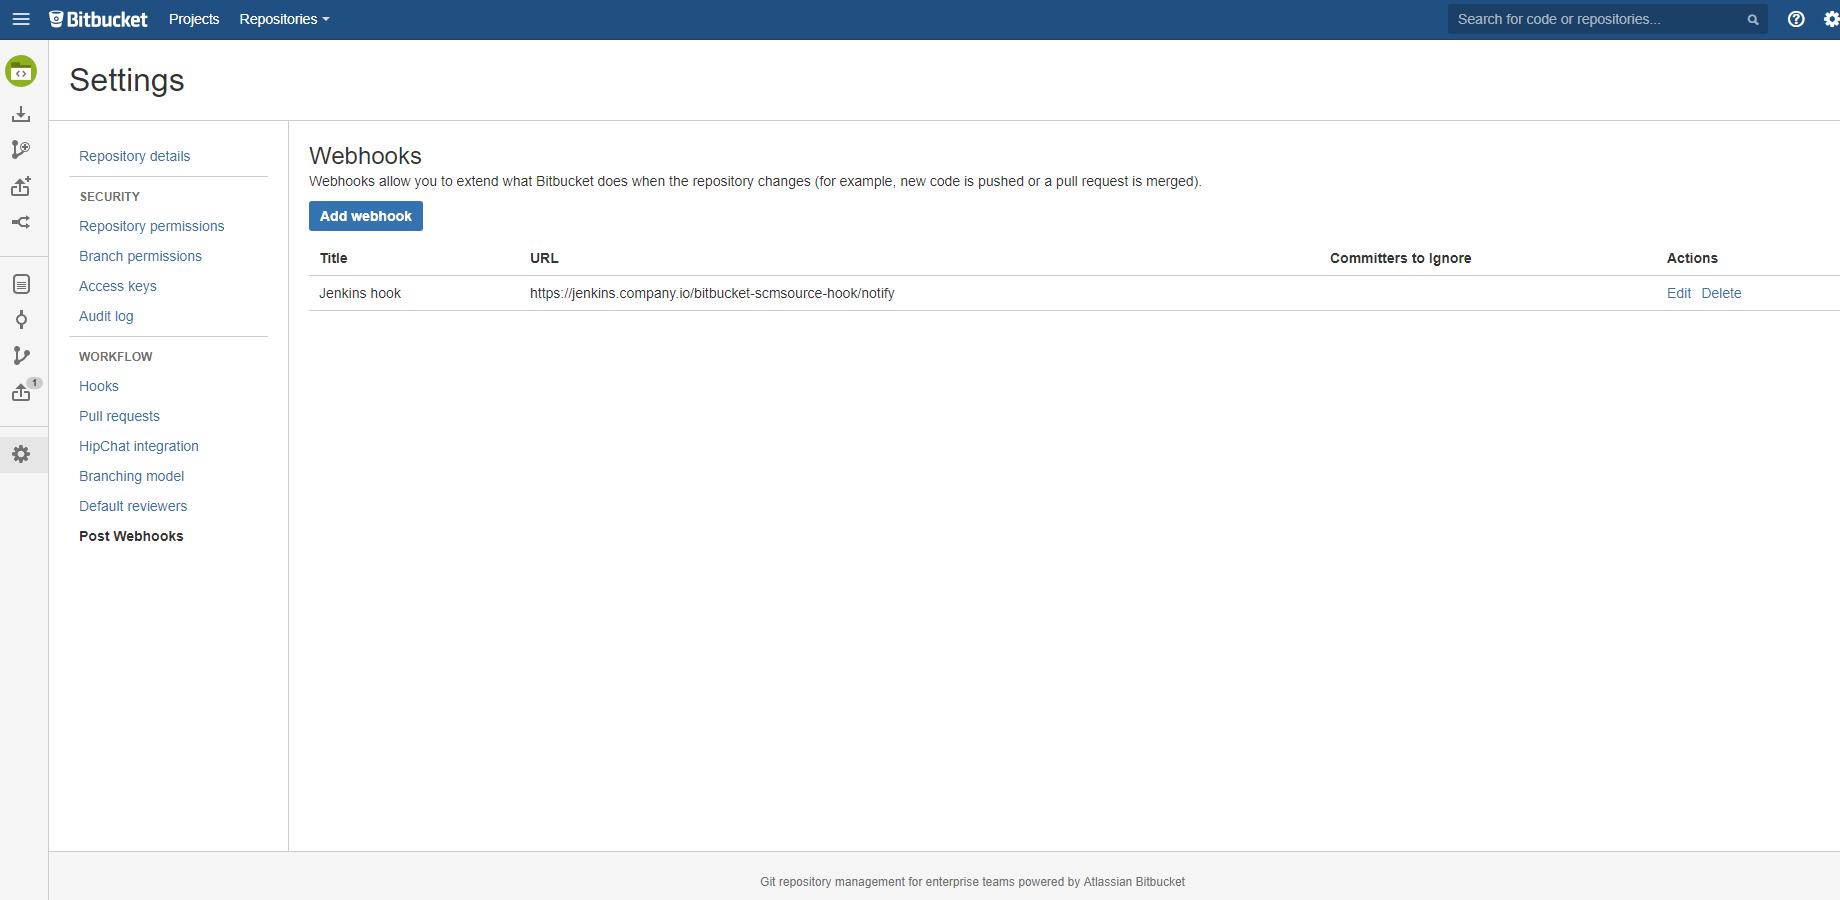 Post Webhooks for Bitbucket 3